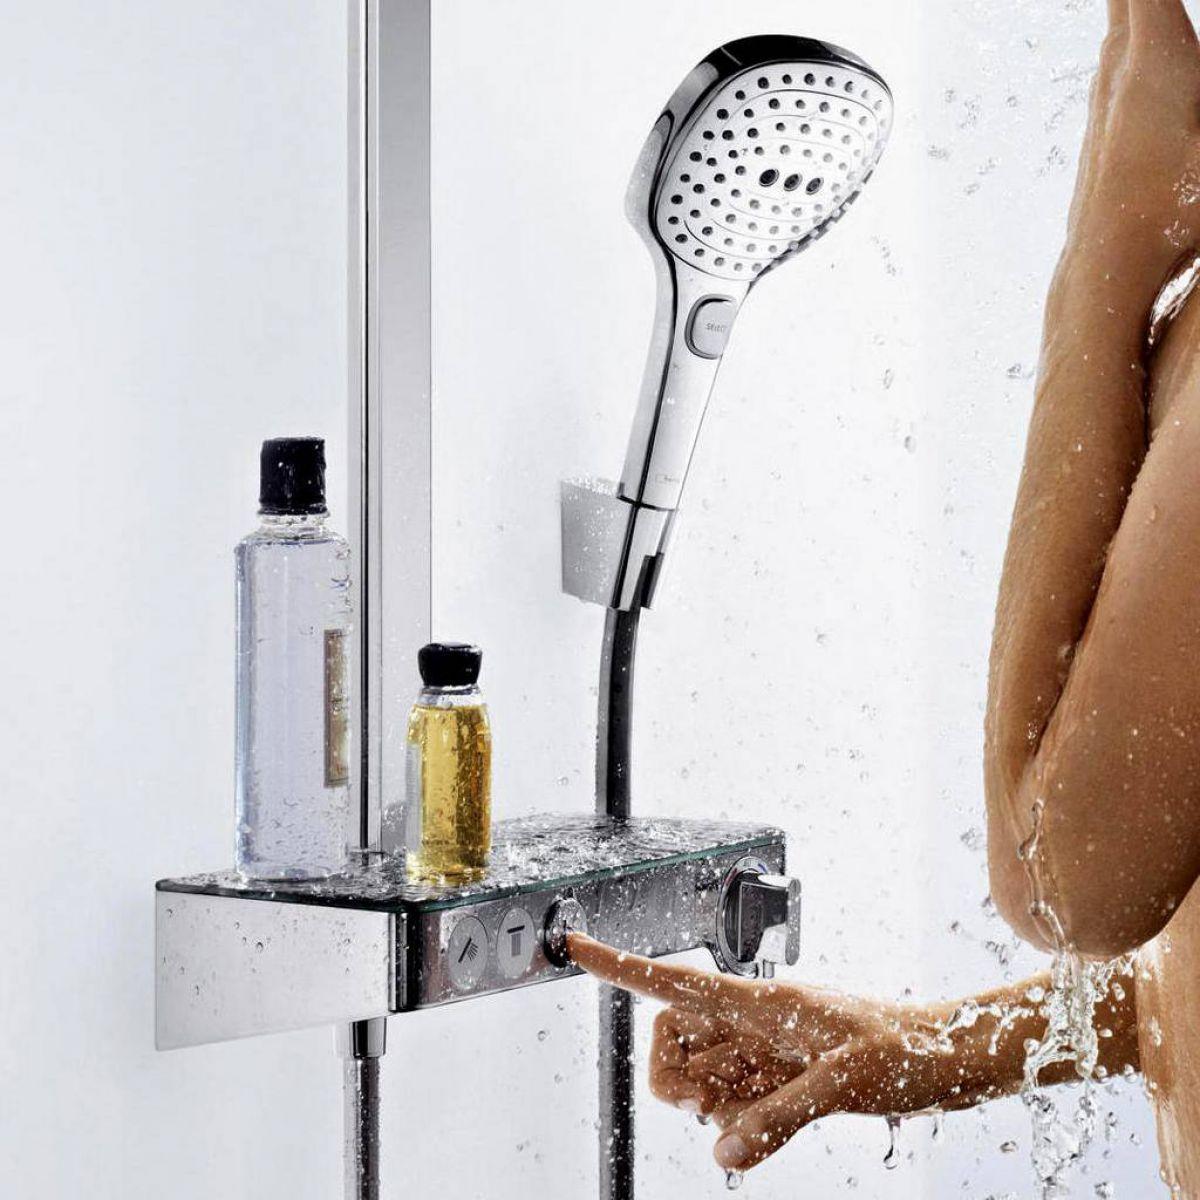 hansgrohe raindance select e 300 3jet st showerpipe uk bathrooms. Black Bedroom Furniture Sets. Home Design Ideas